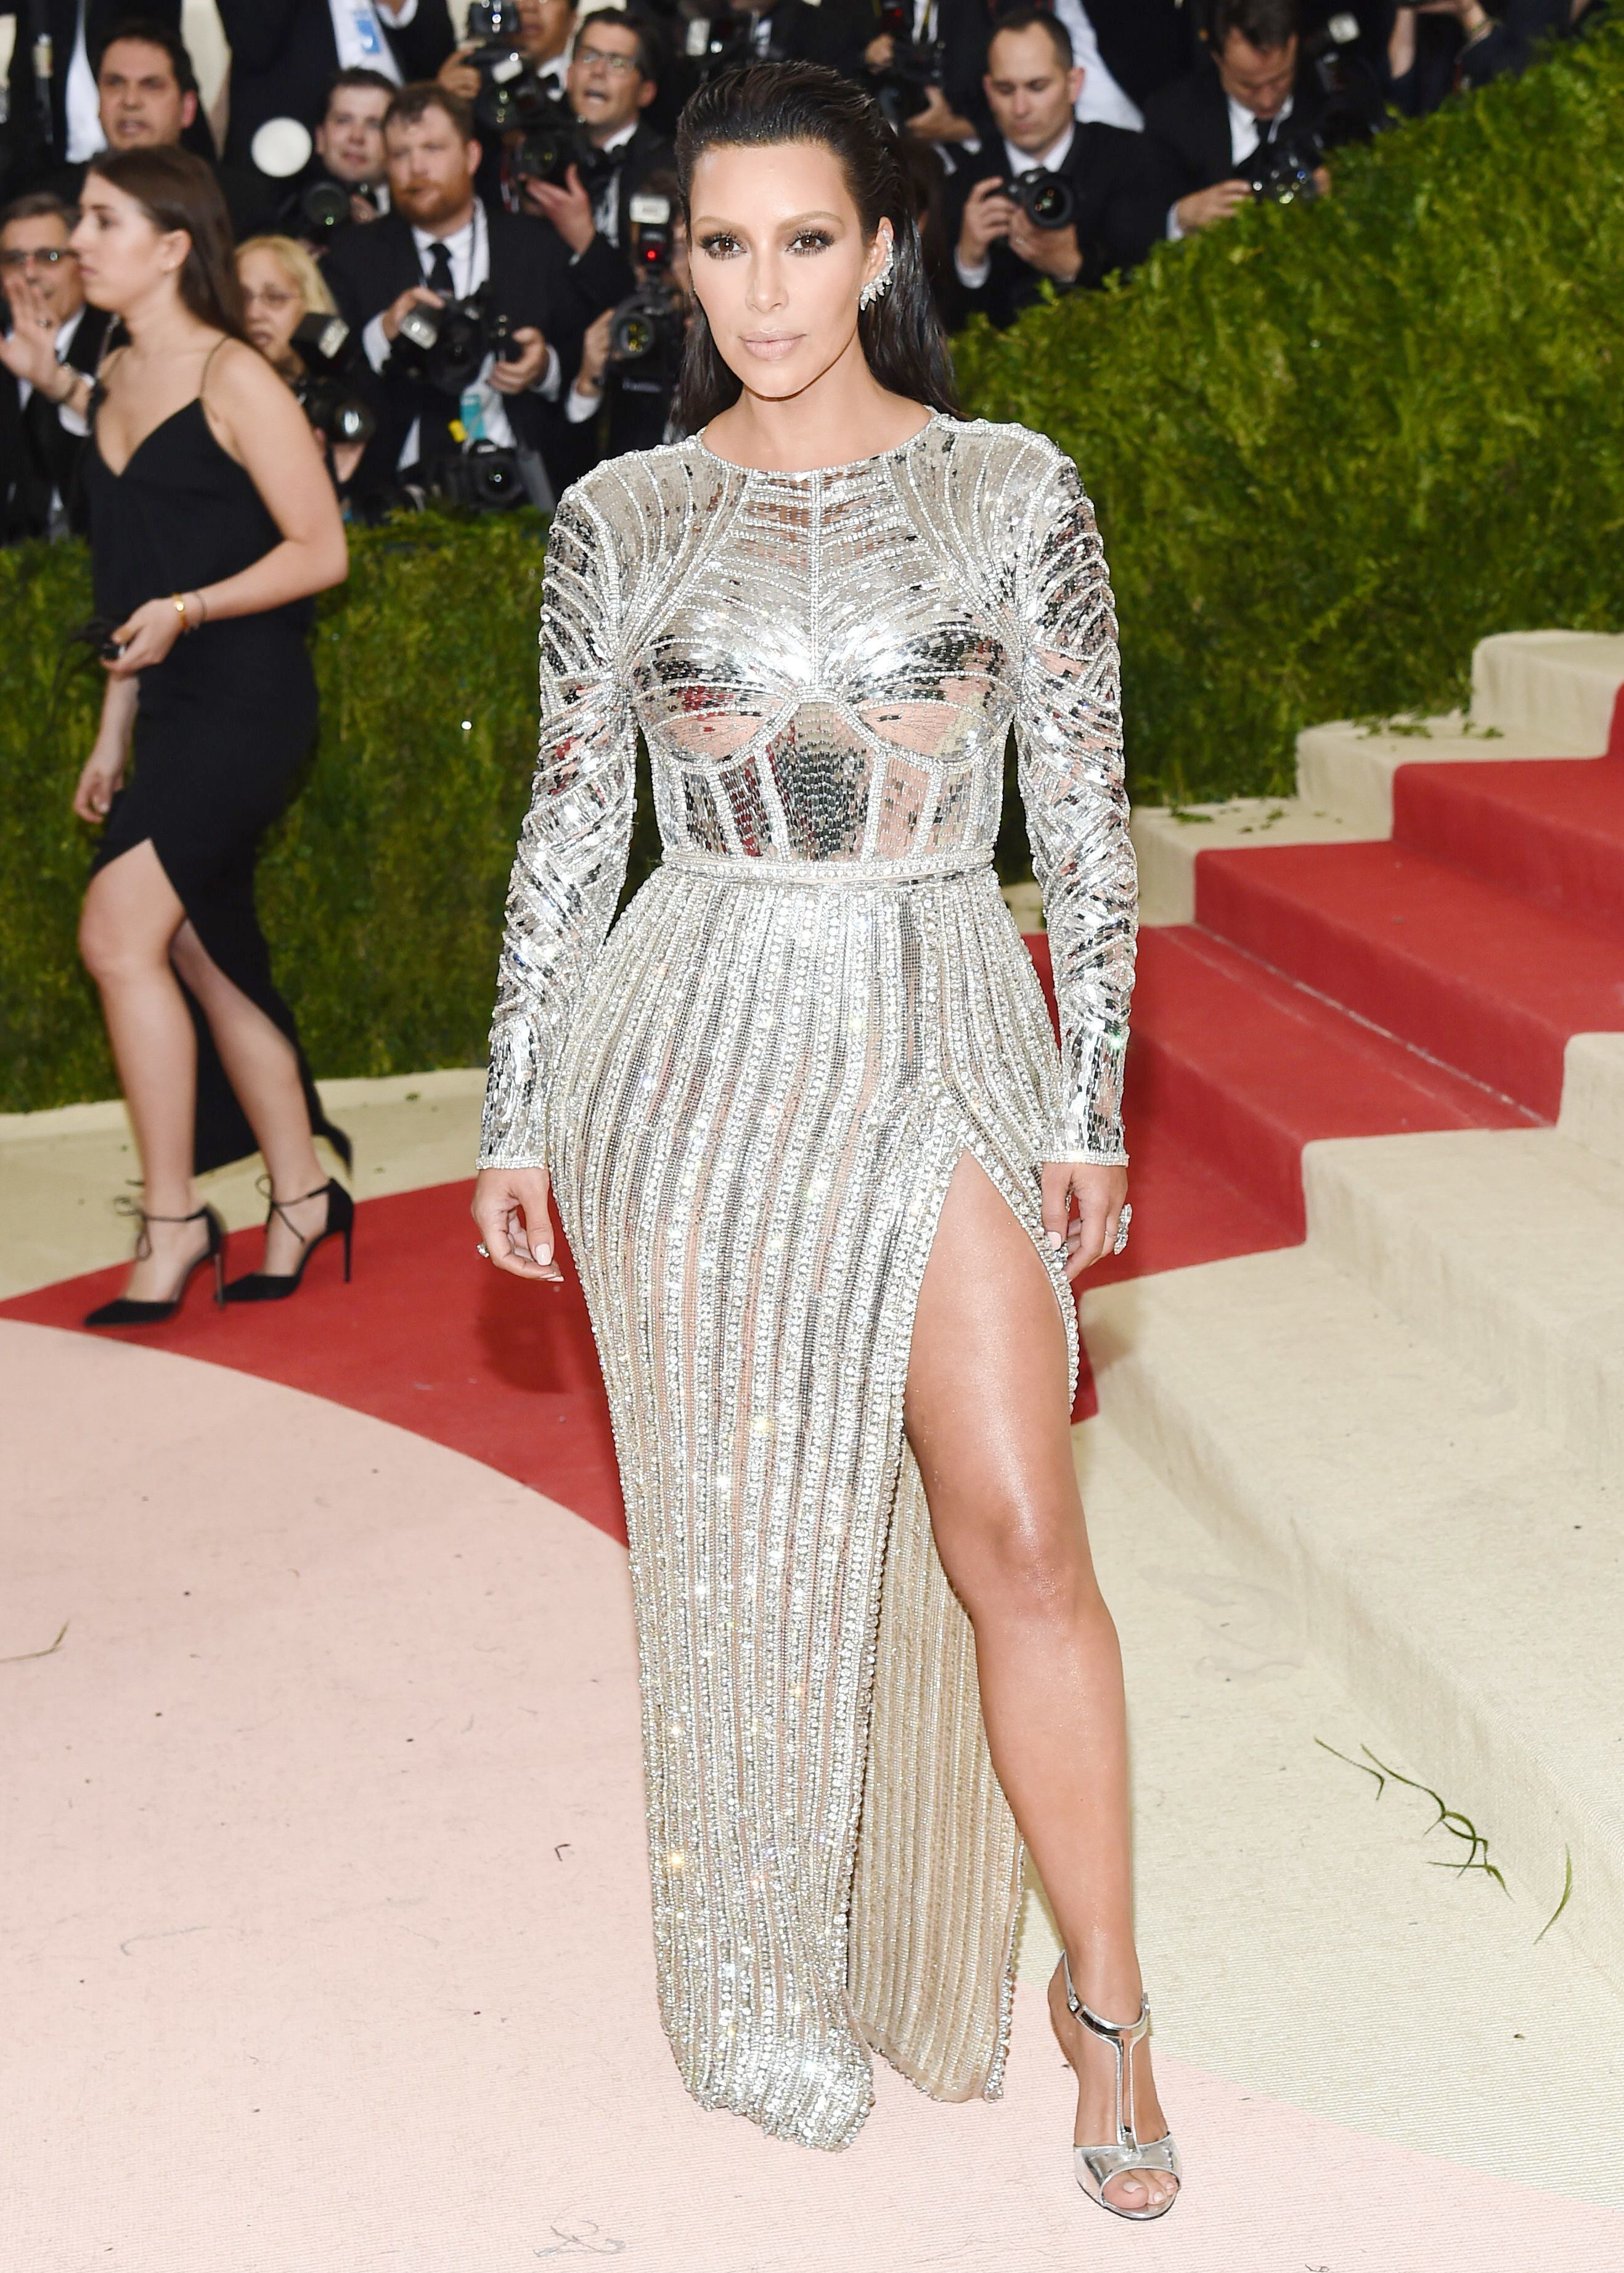 Kim Kardashian to make first major public appearance since robbery